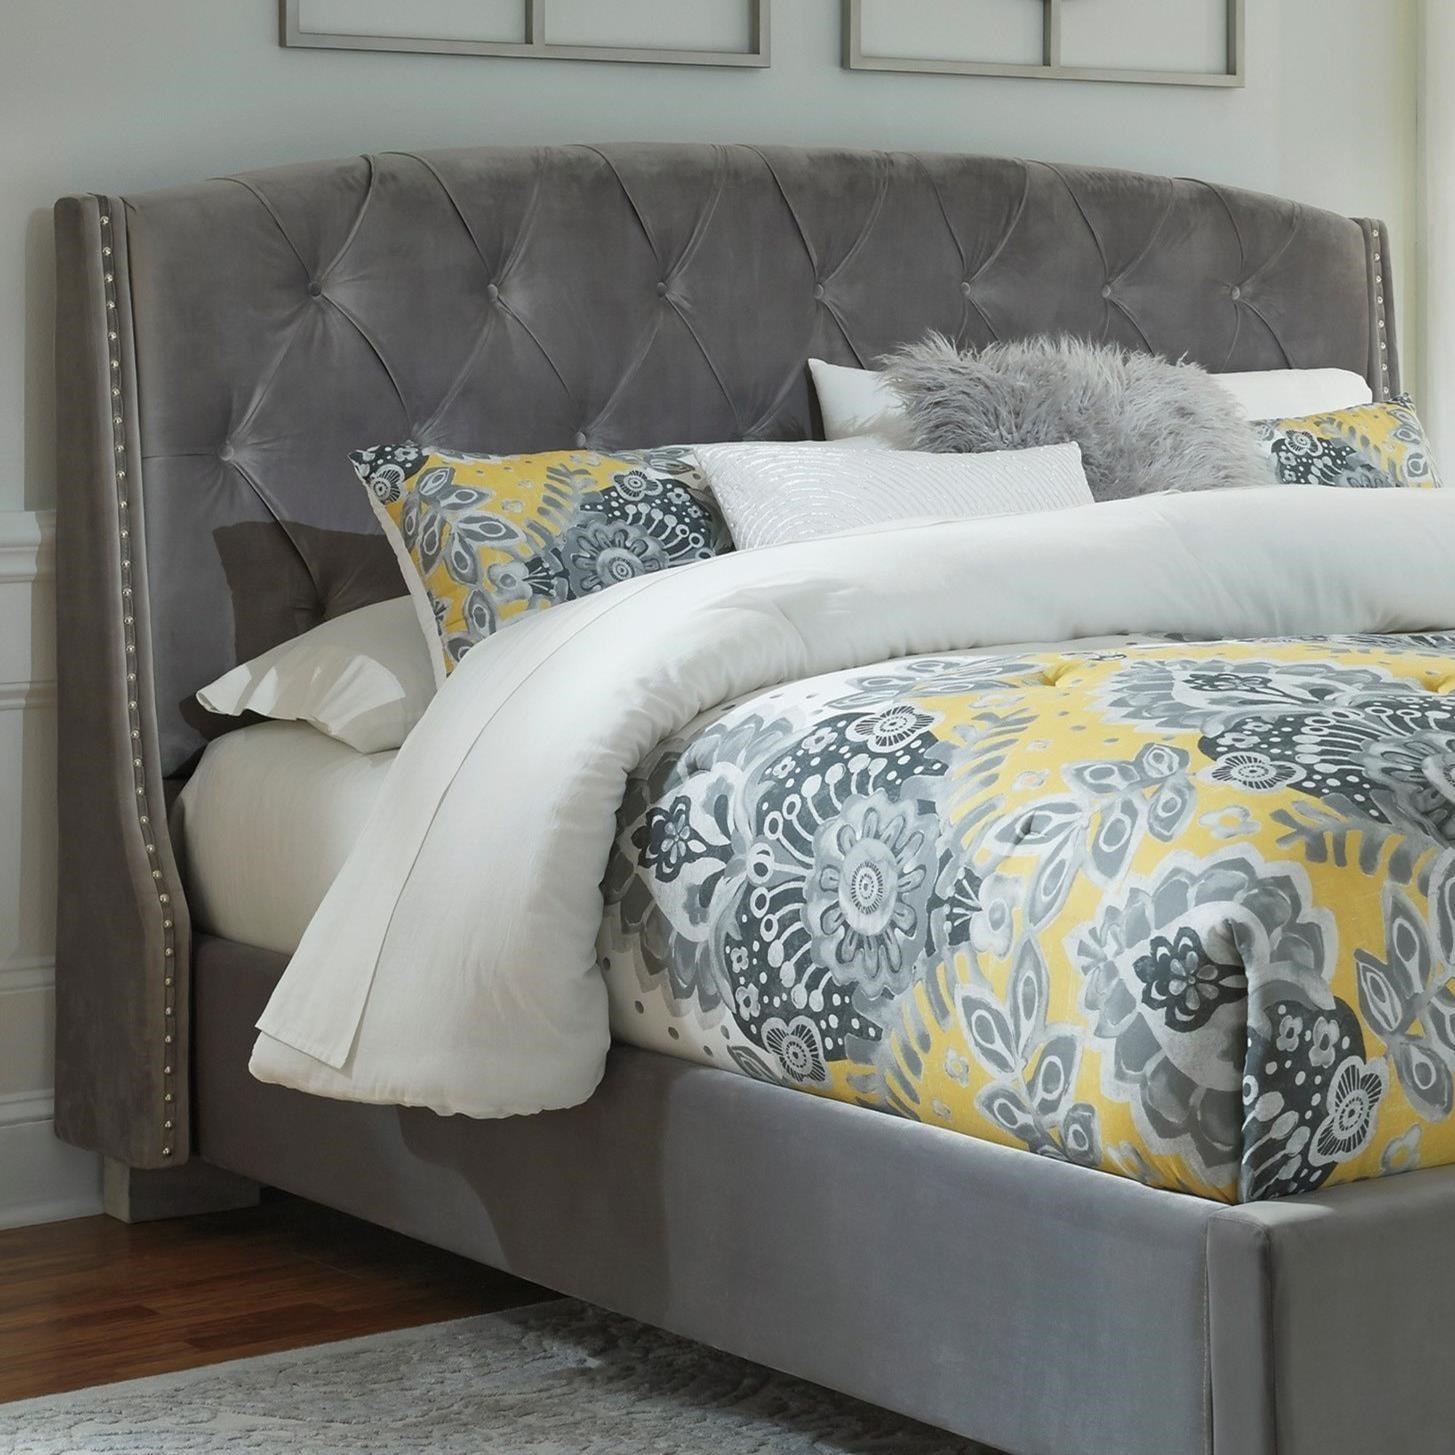 queen upholstered headboard and frame beige signature design by ashley kasidon queen upholstered headboard in gray velvet